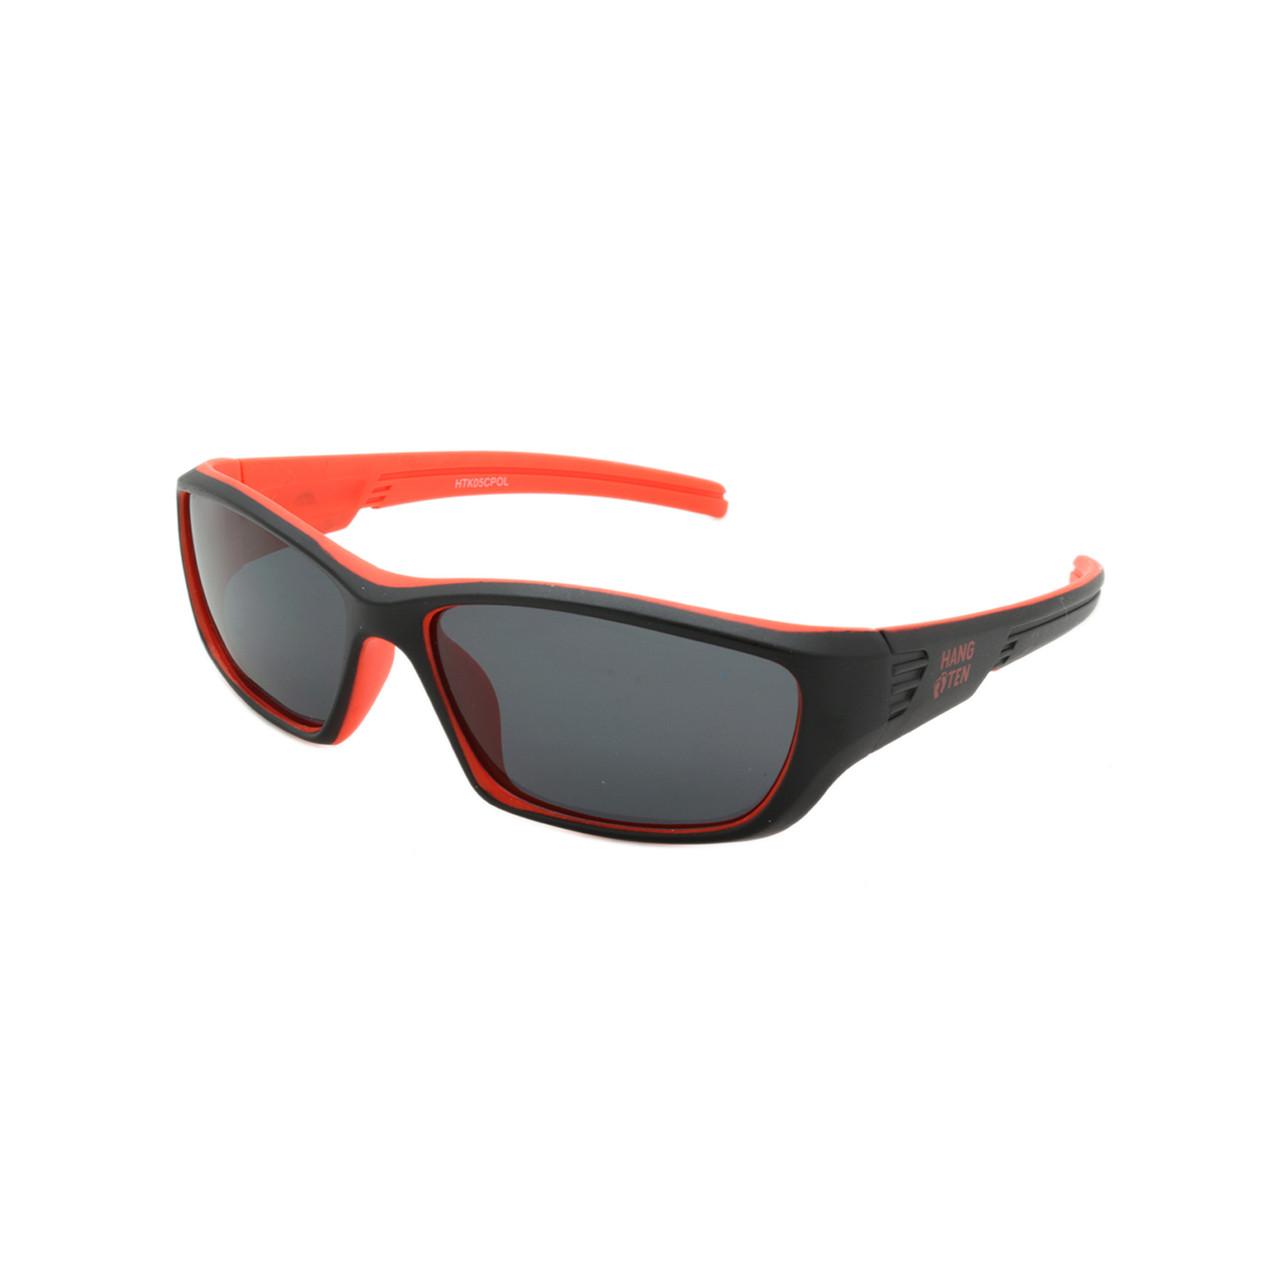 9bf5d59c43 Wholesale Black Red Plastic Hang Ten Kids UV400 Sport Wrap Sunglasses Kids  Bulk